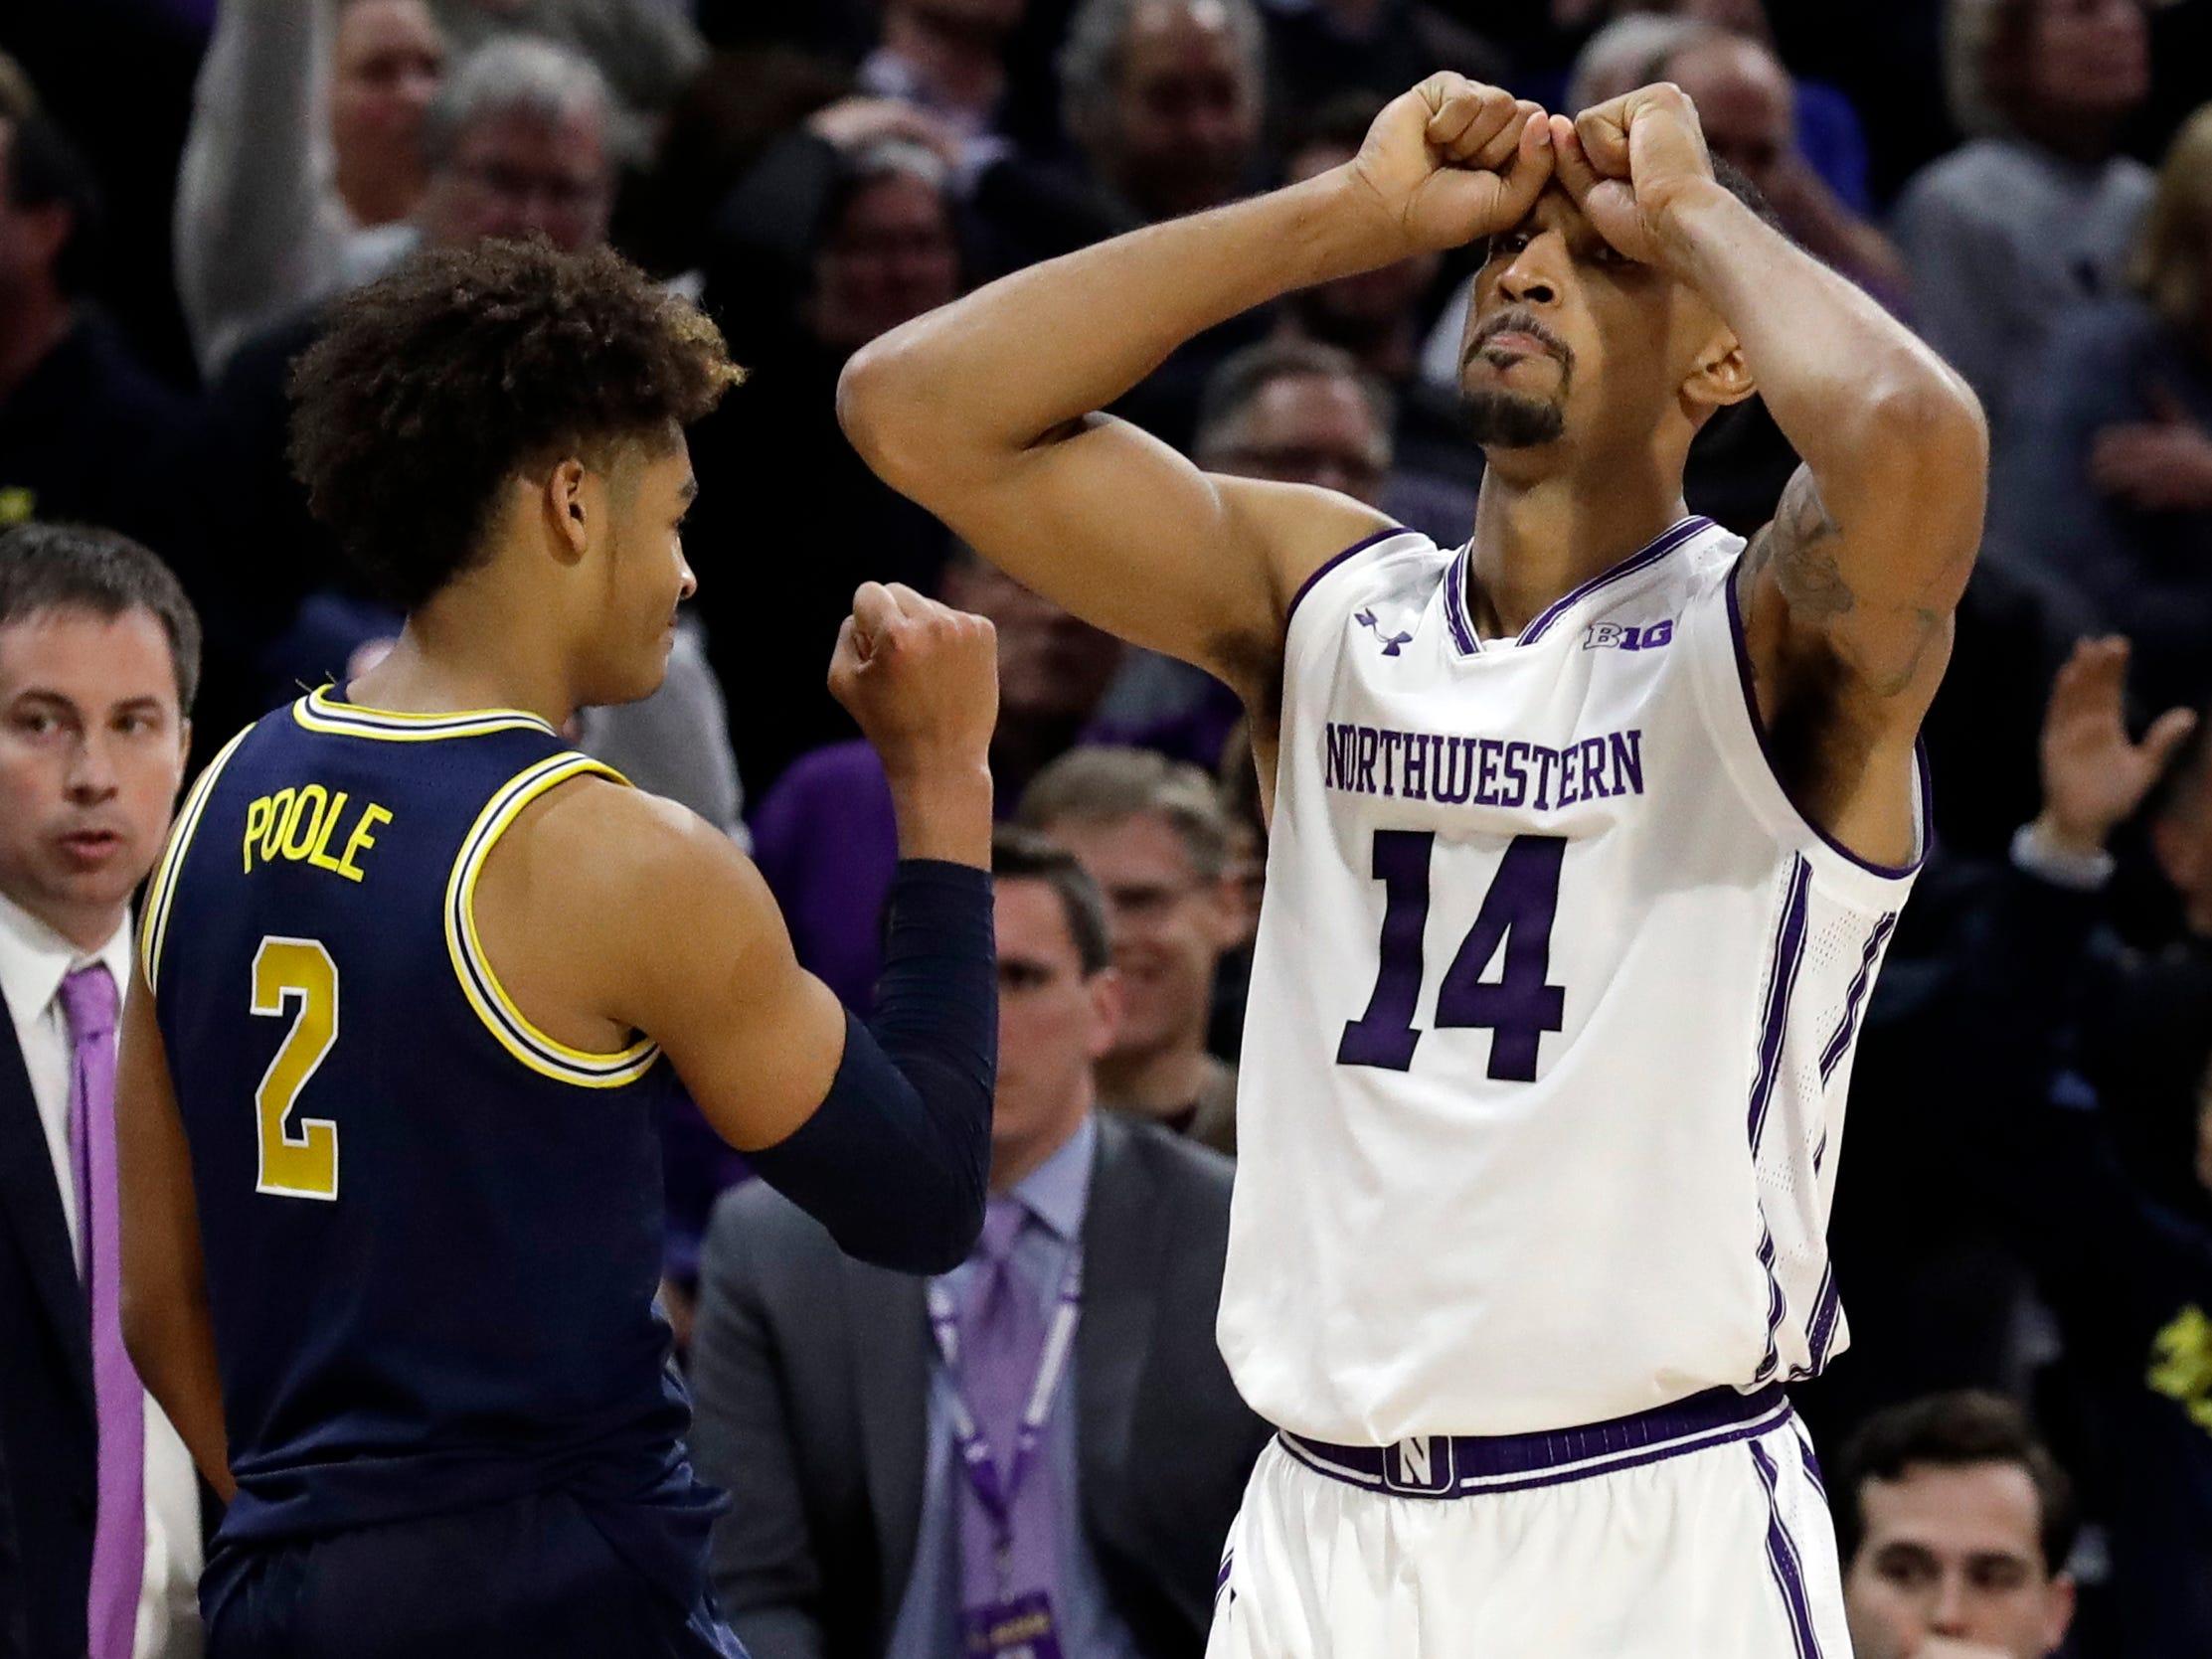 Northwestern guard Ryan Taylor, right, reacts after missing a basket as Michigan guard Jordan Poole celebrates after Michigan defeated Northwestern 62-60.